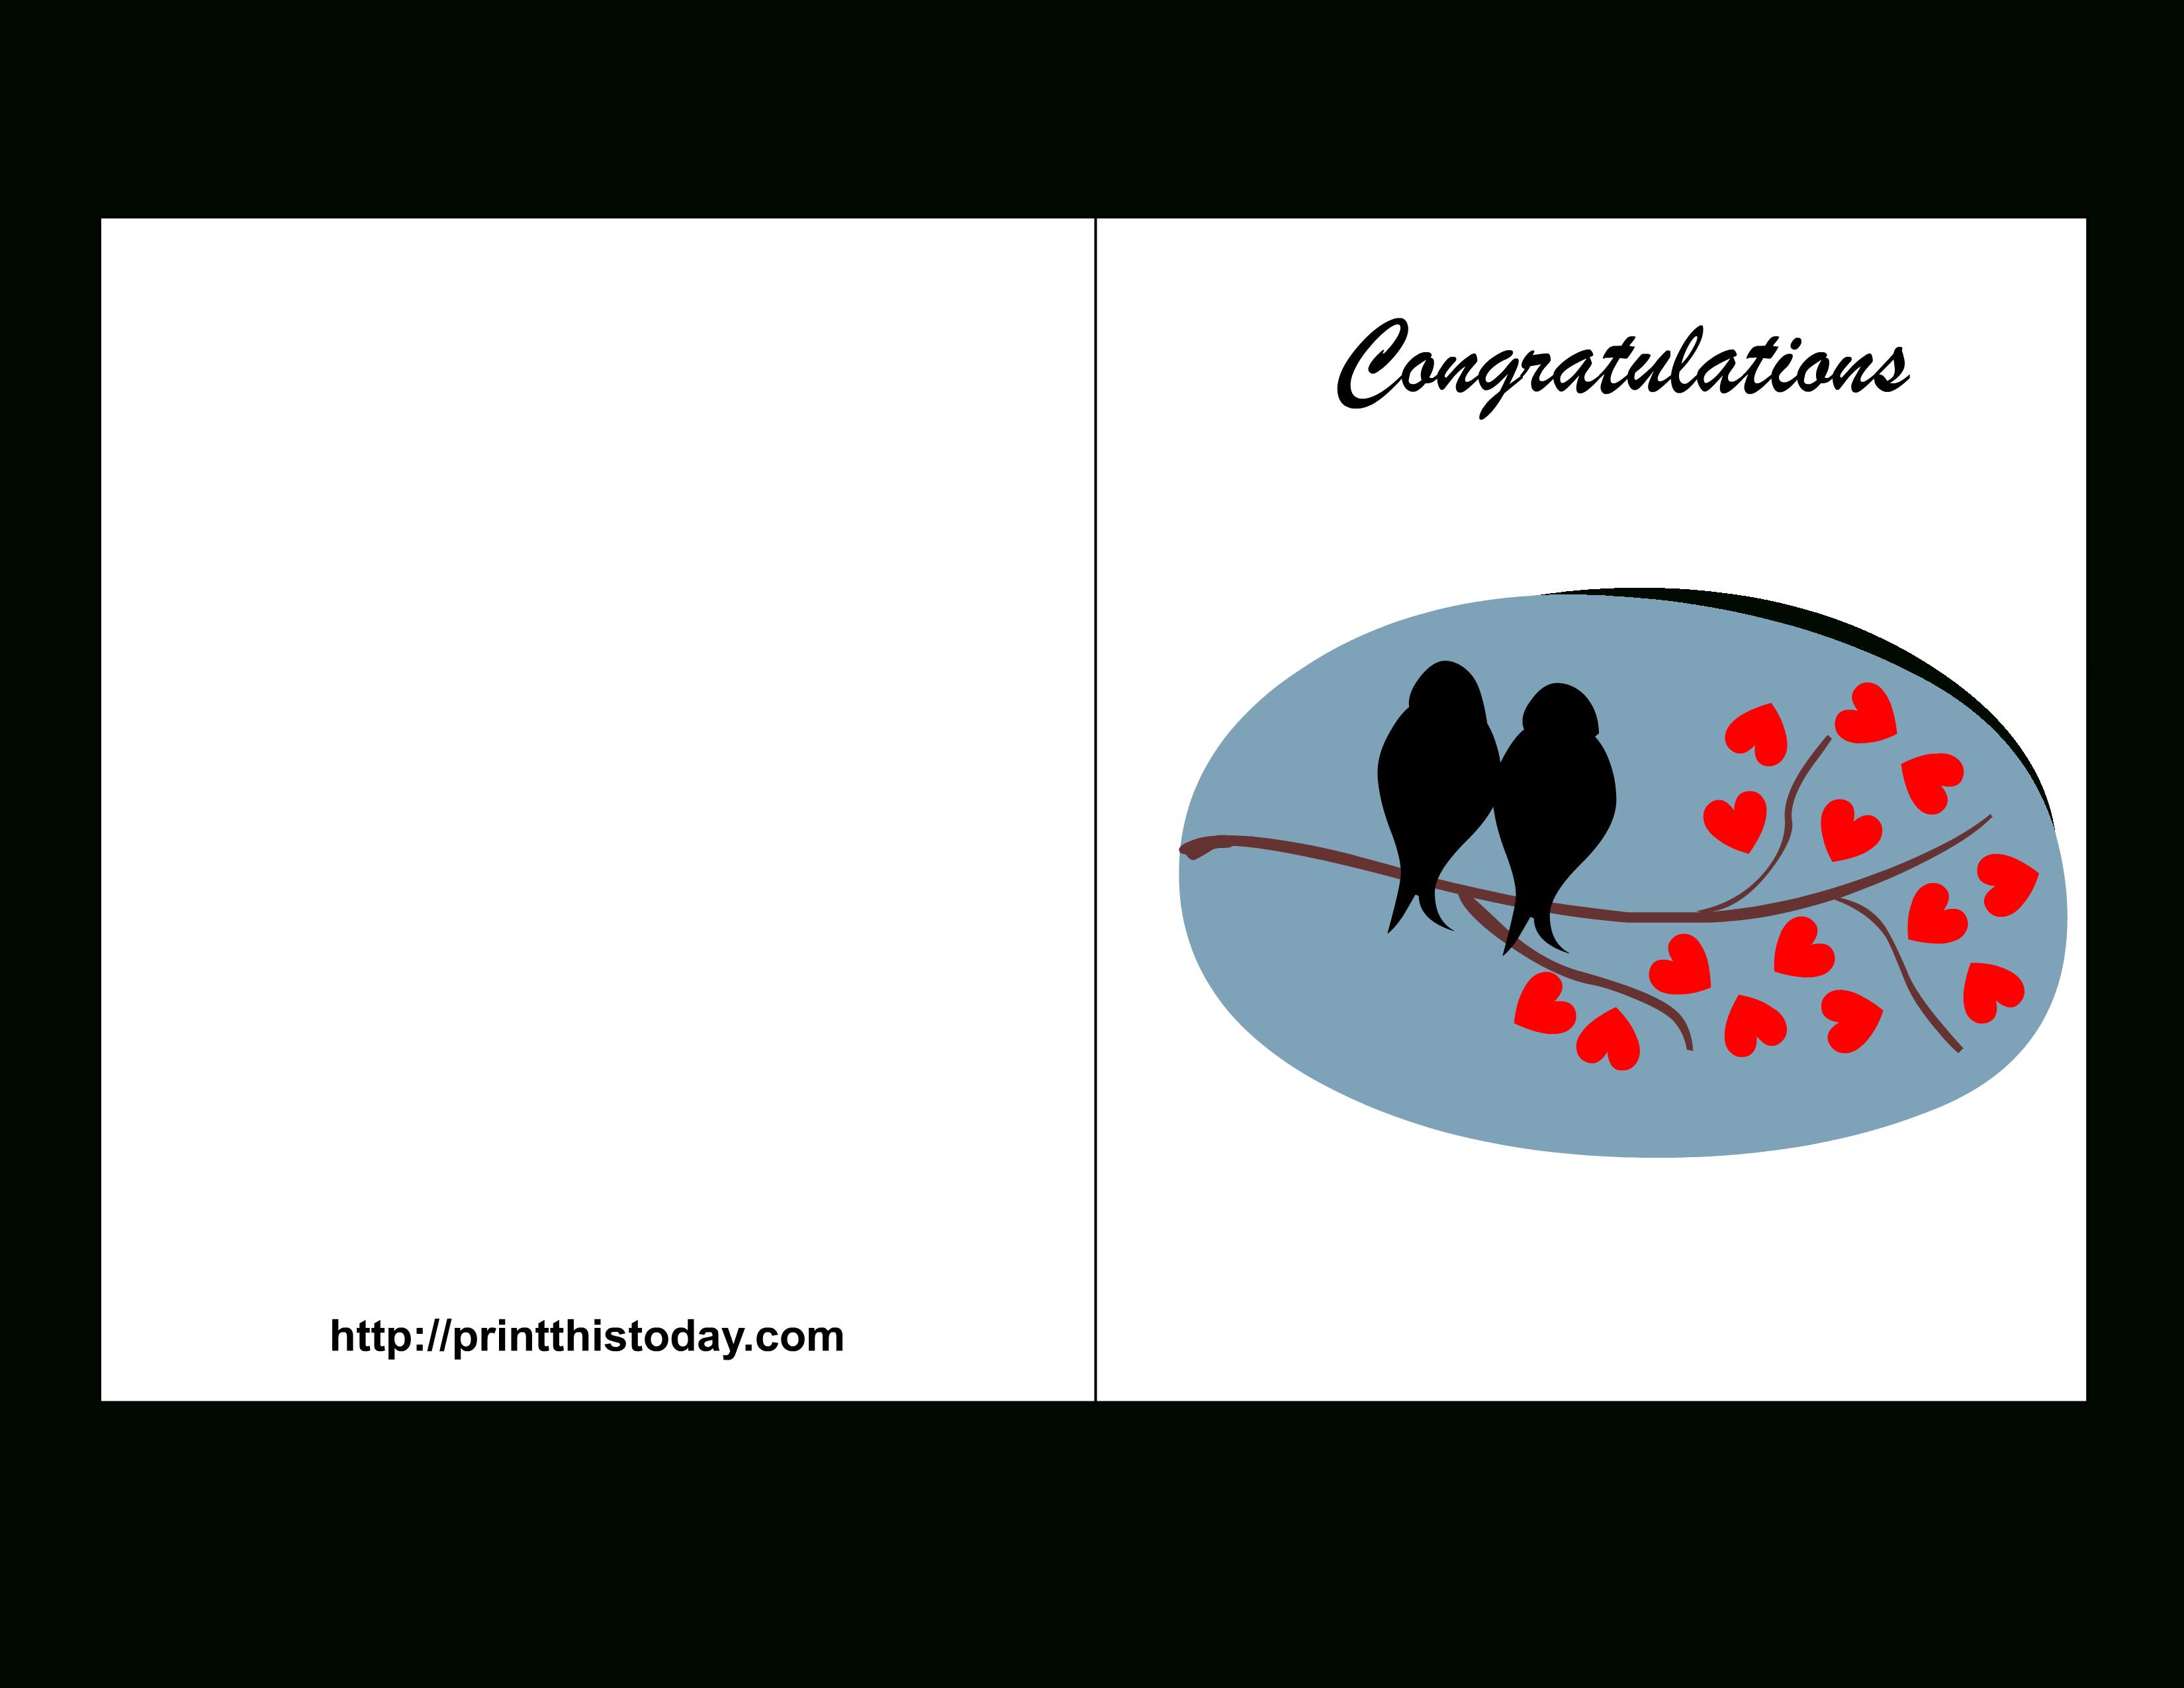 Free Png Wedding Congratulations & Free Wedding Congratulations - Wedding Wish Cards Printable Free